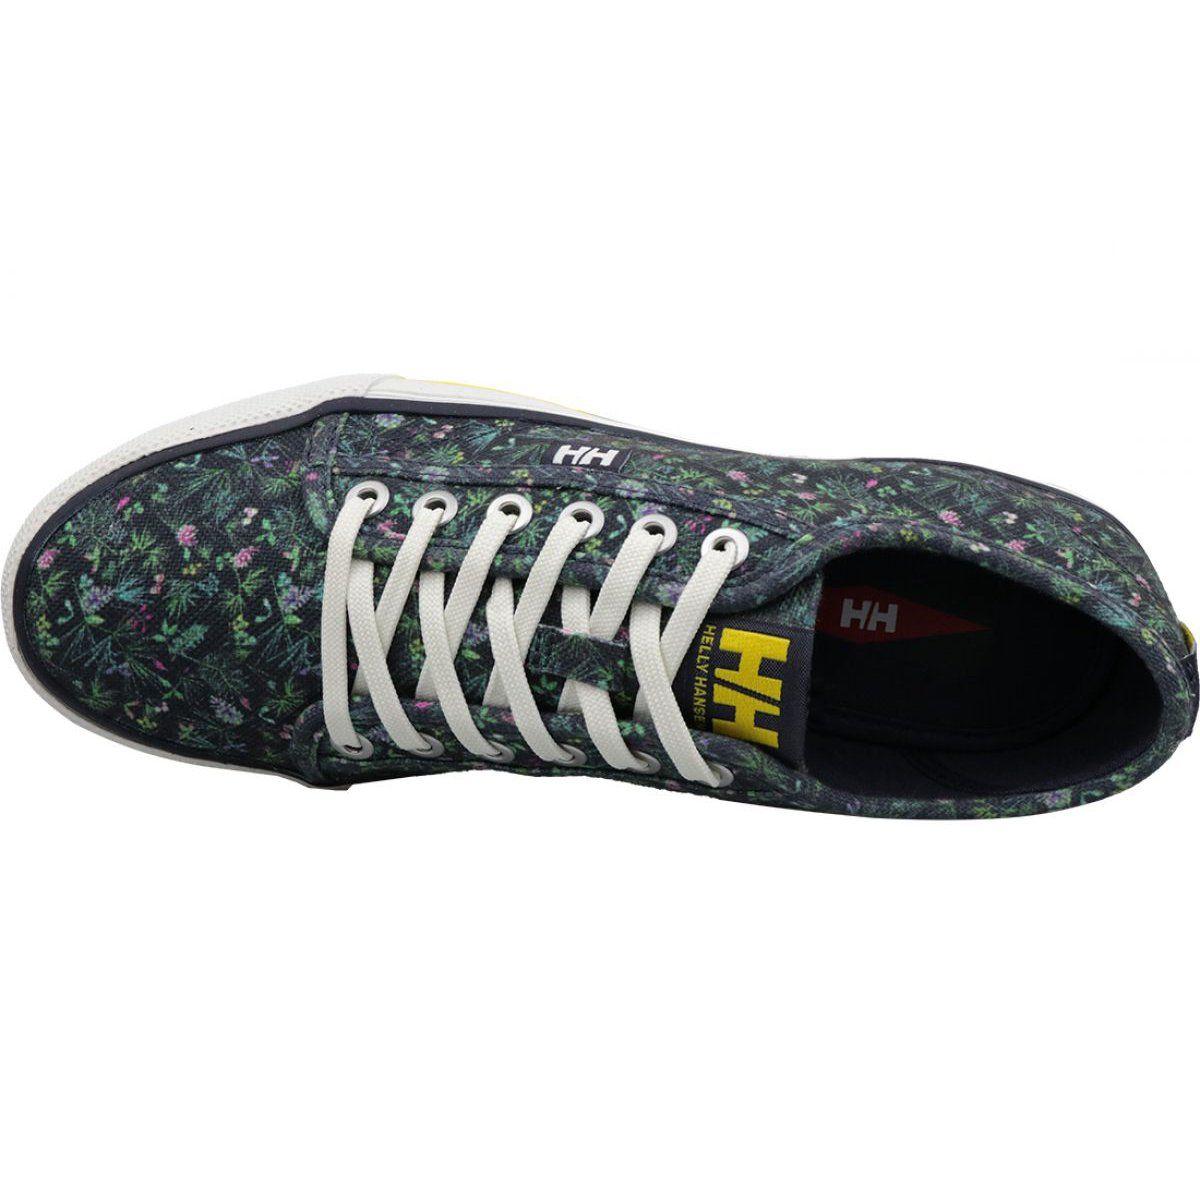 Buty Helly Hansen Fjord Canvas Shoe V2 W 11466 580 Granatowe Canvas Shoes Trainers Women Helly Hansen